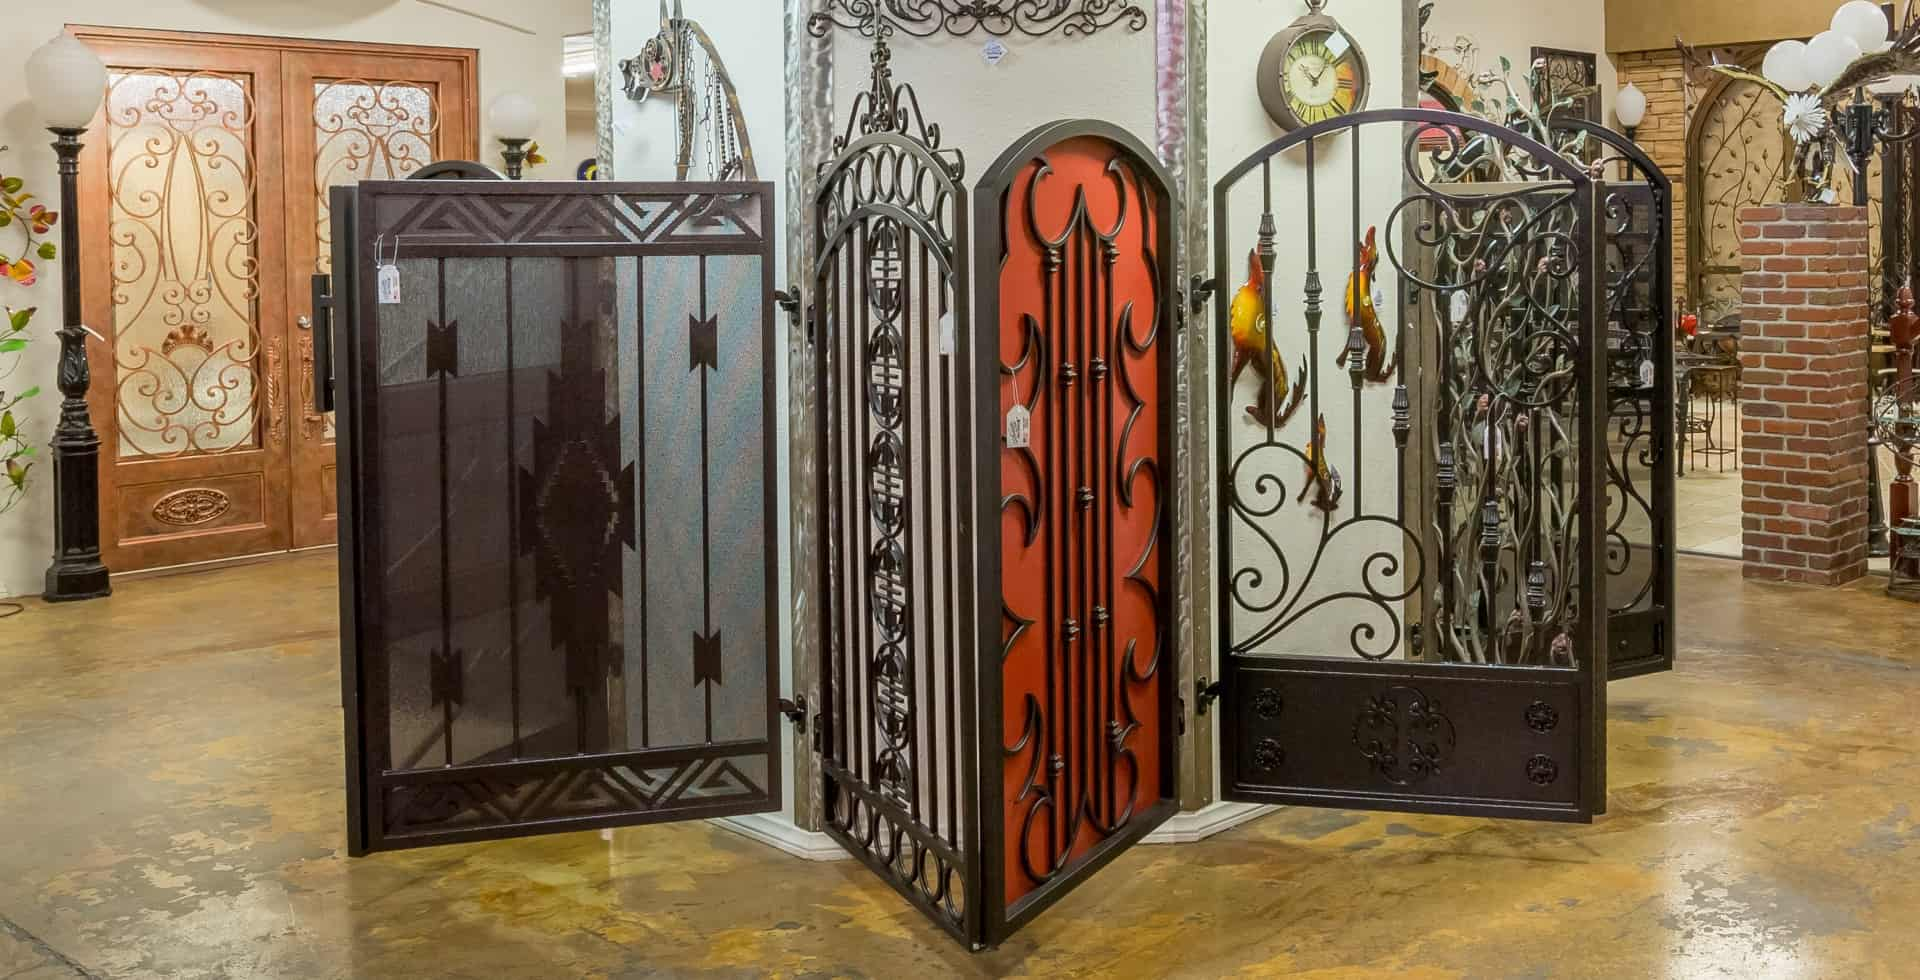 Custom Iron Gate Doors LV Wrought Iron Design In Las Vegas